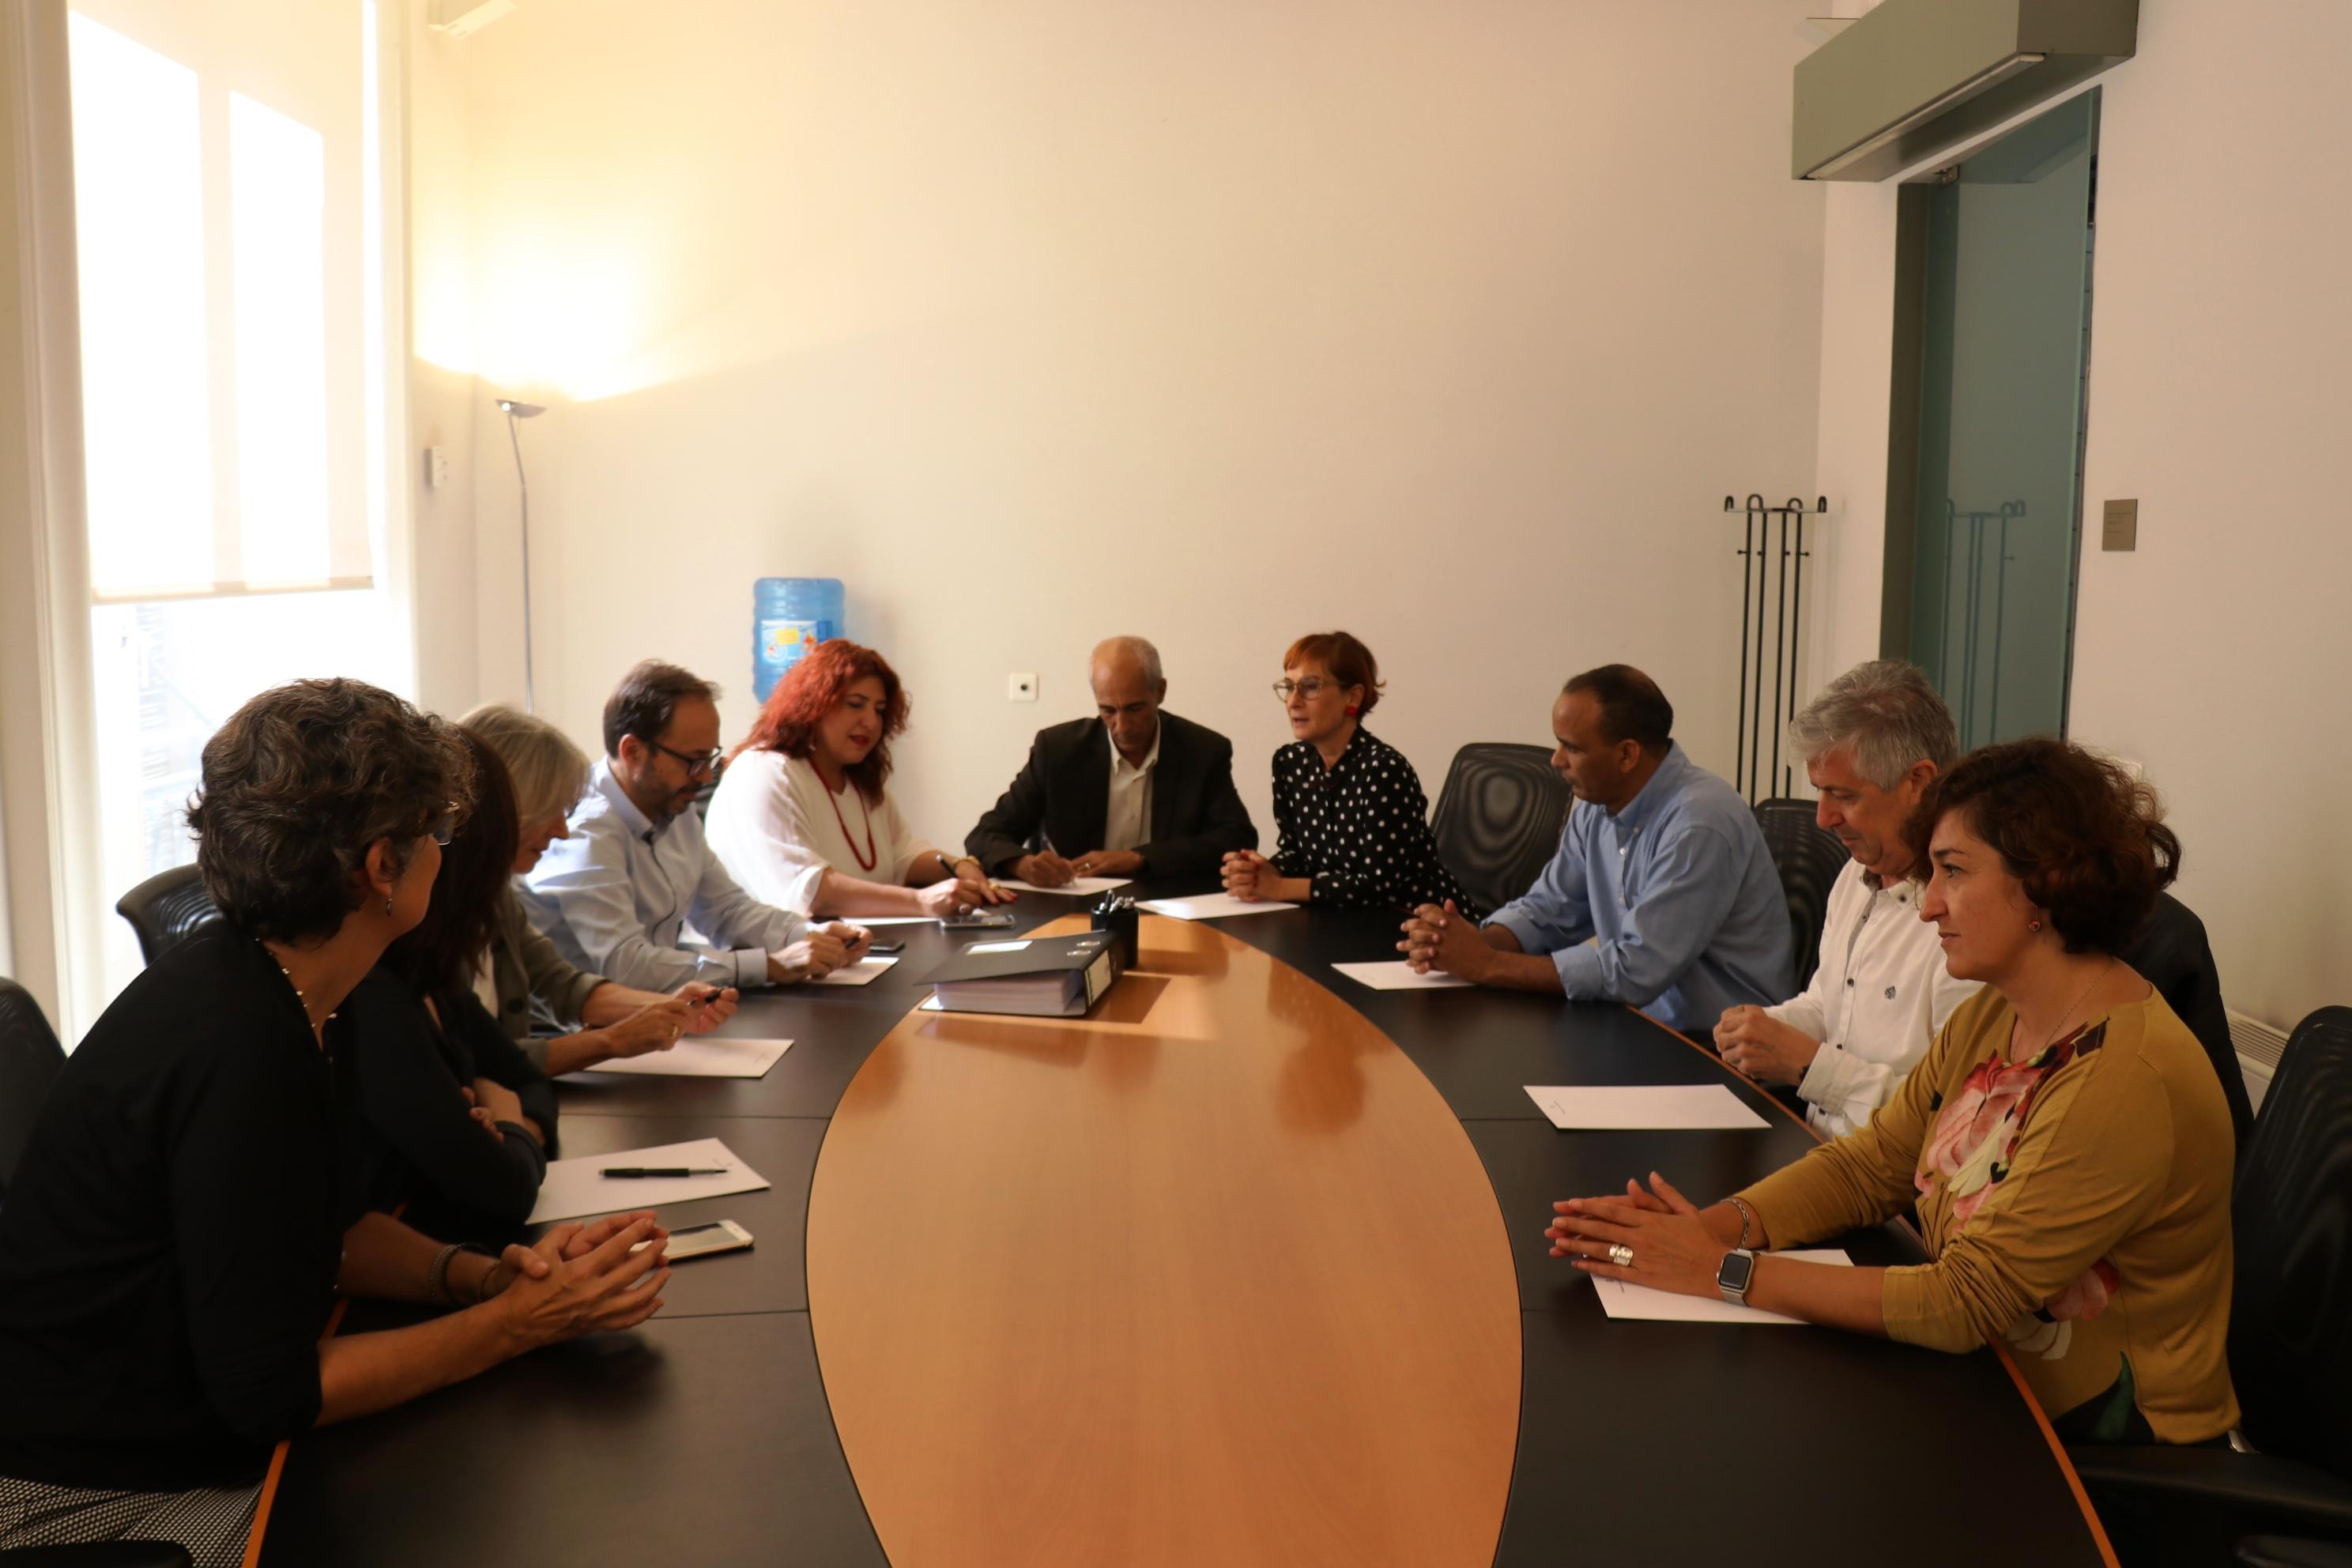 http://contingutsweb.parlamentib.es/comunicacio/9/Mahmud9.jpg